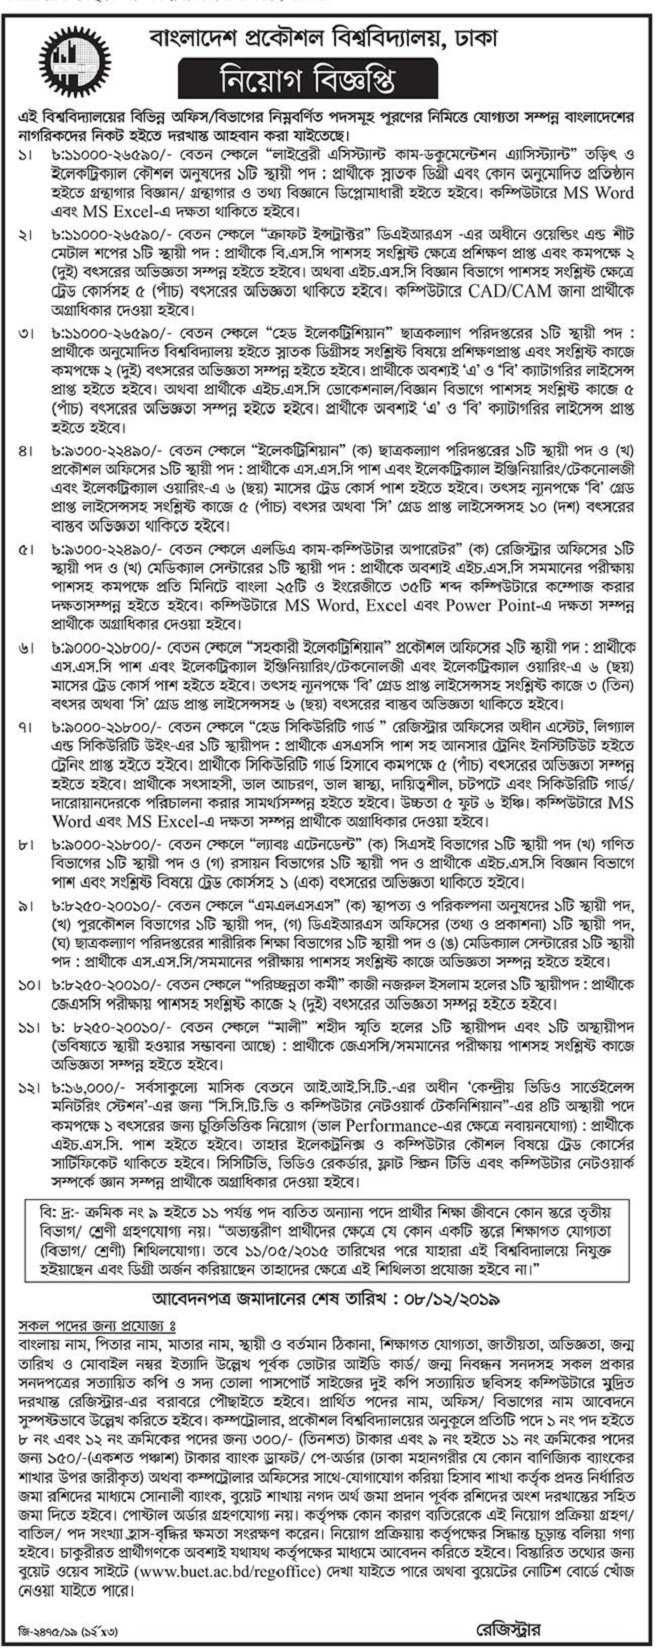 Bangladesh University of Engineering and Technology (BUET) Job Circular 2019